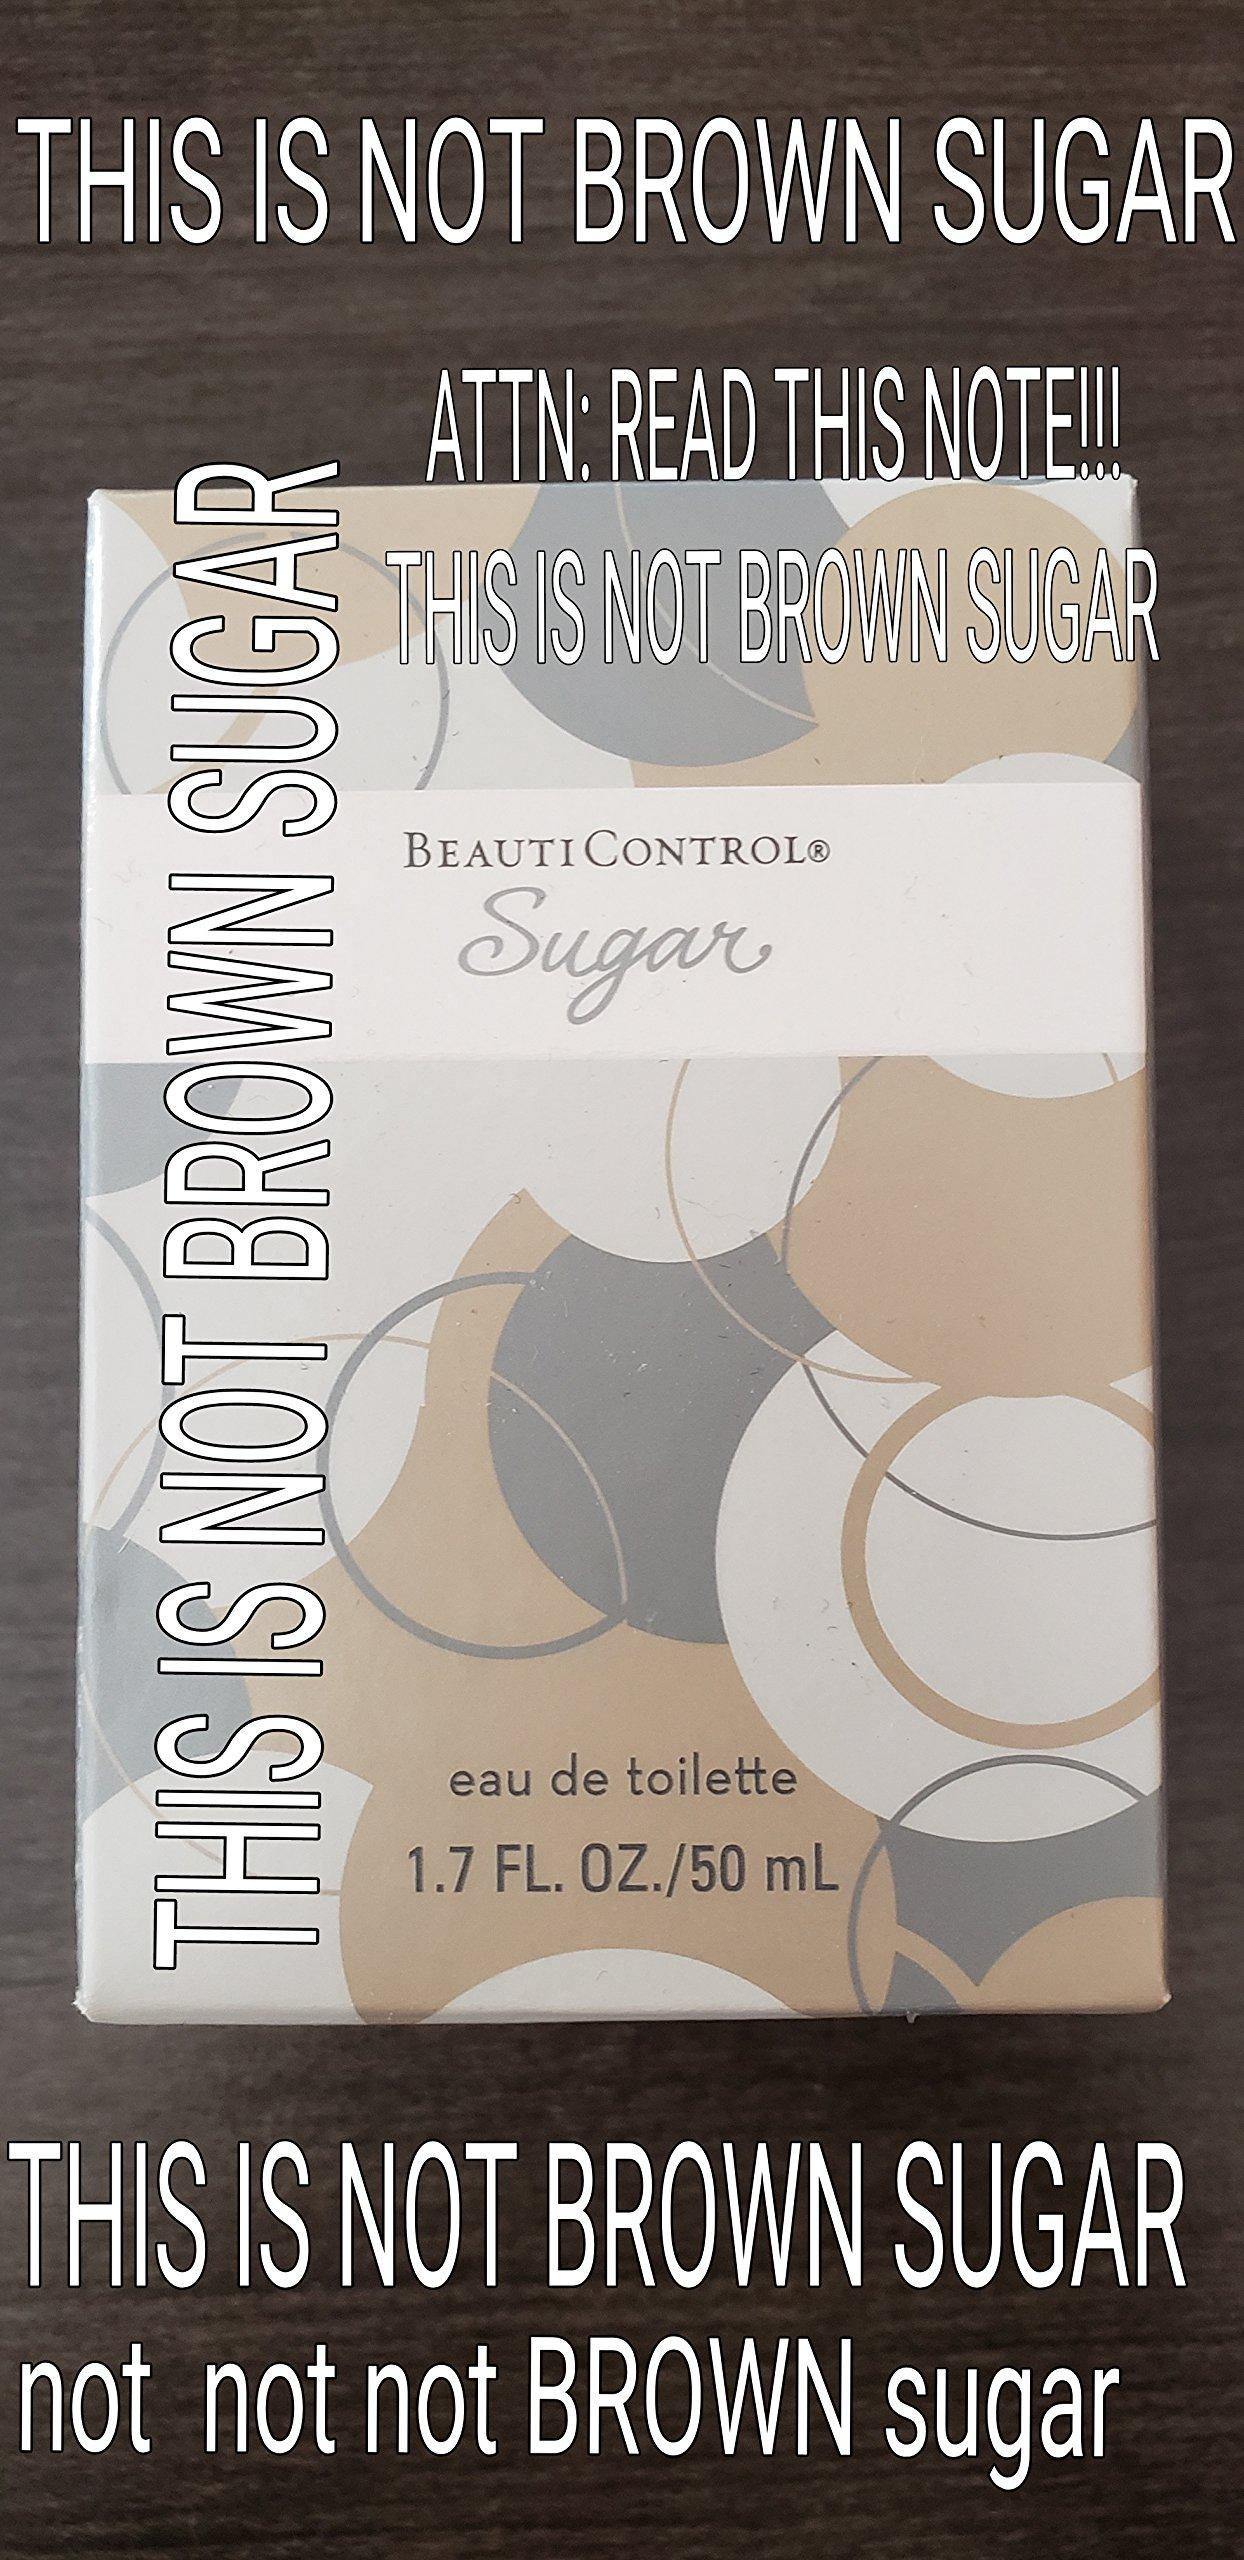 Amazon Beauticontrol Sugar Eau De Toilette Beauty